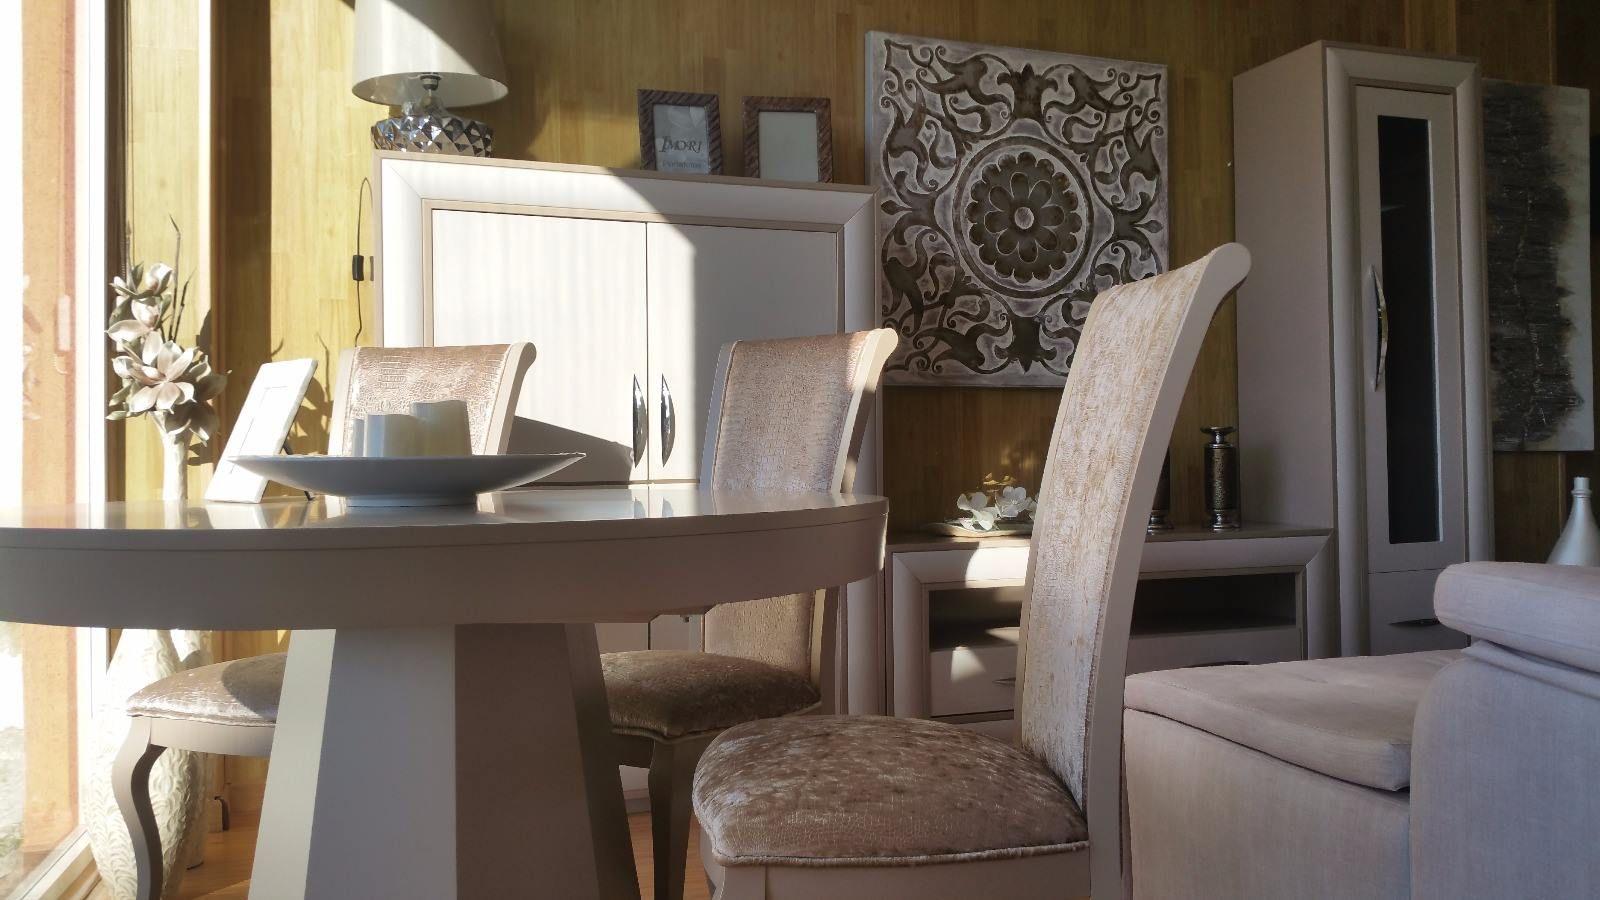 Tiendas de mueblesen Murcia